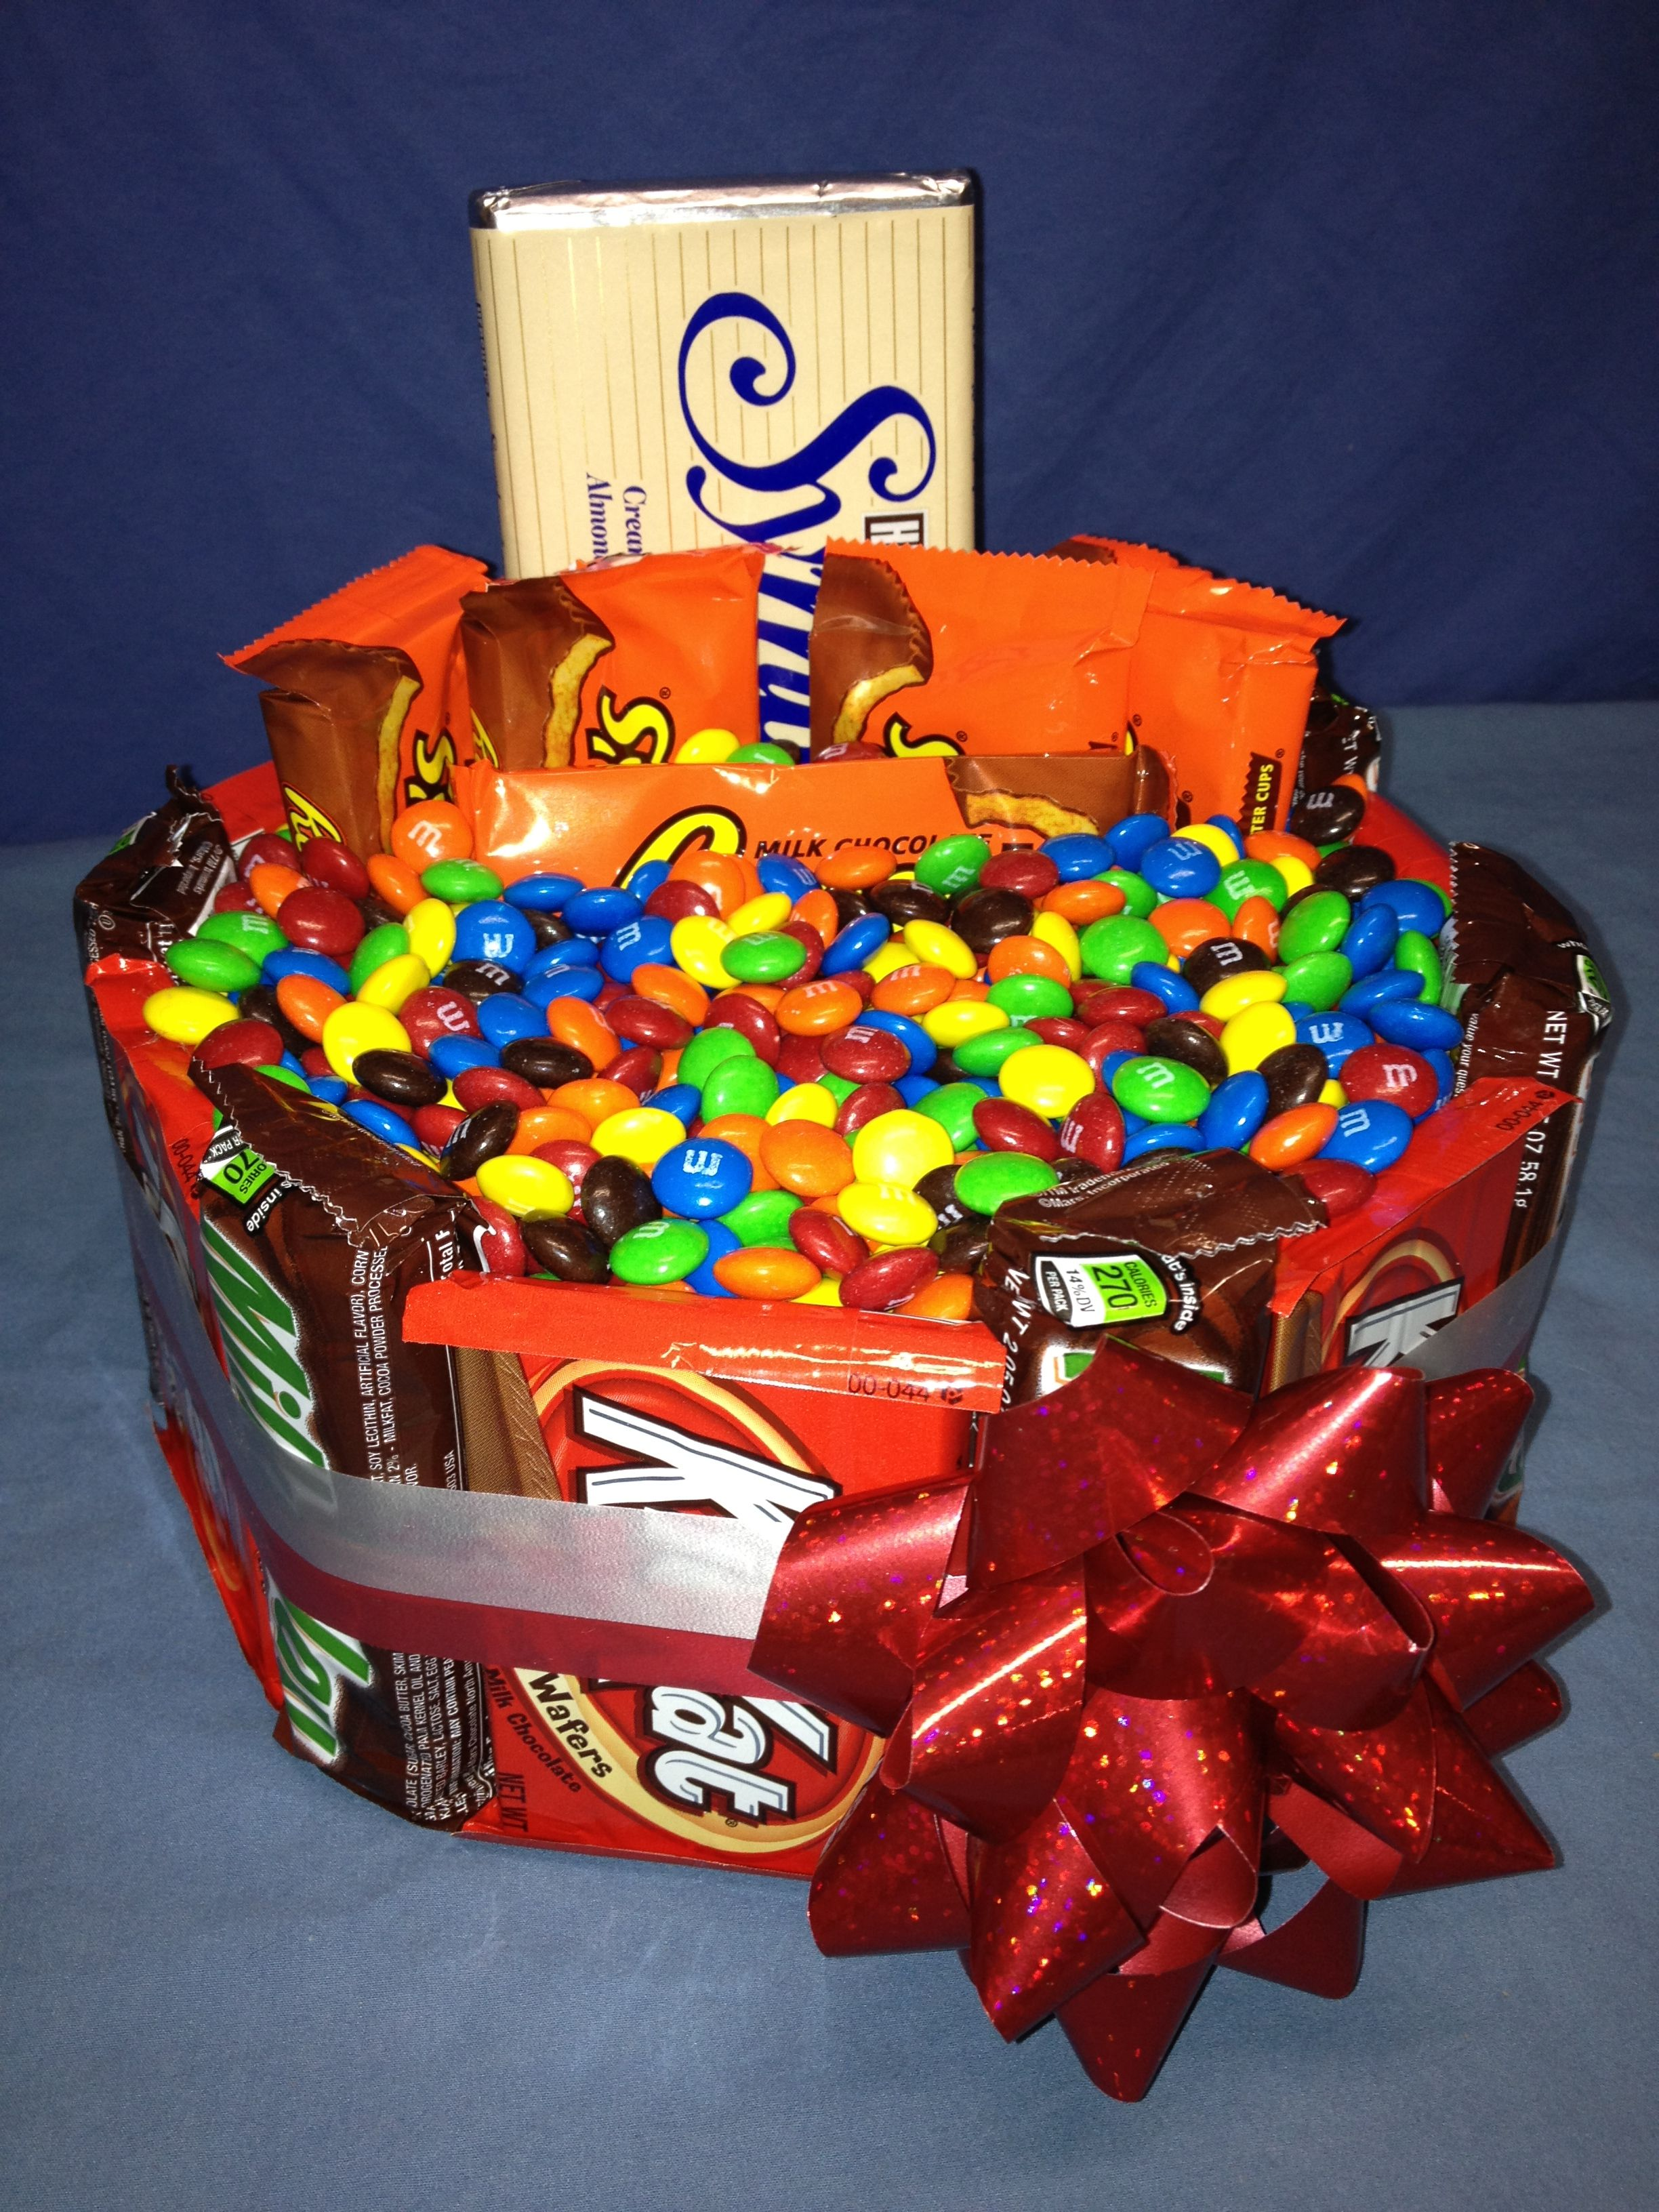 Chocolate Bar Gift Boxes : M s reese kit kat hershey milky way candy bar gift